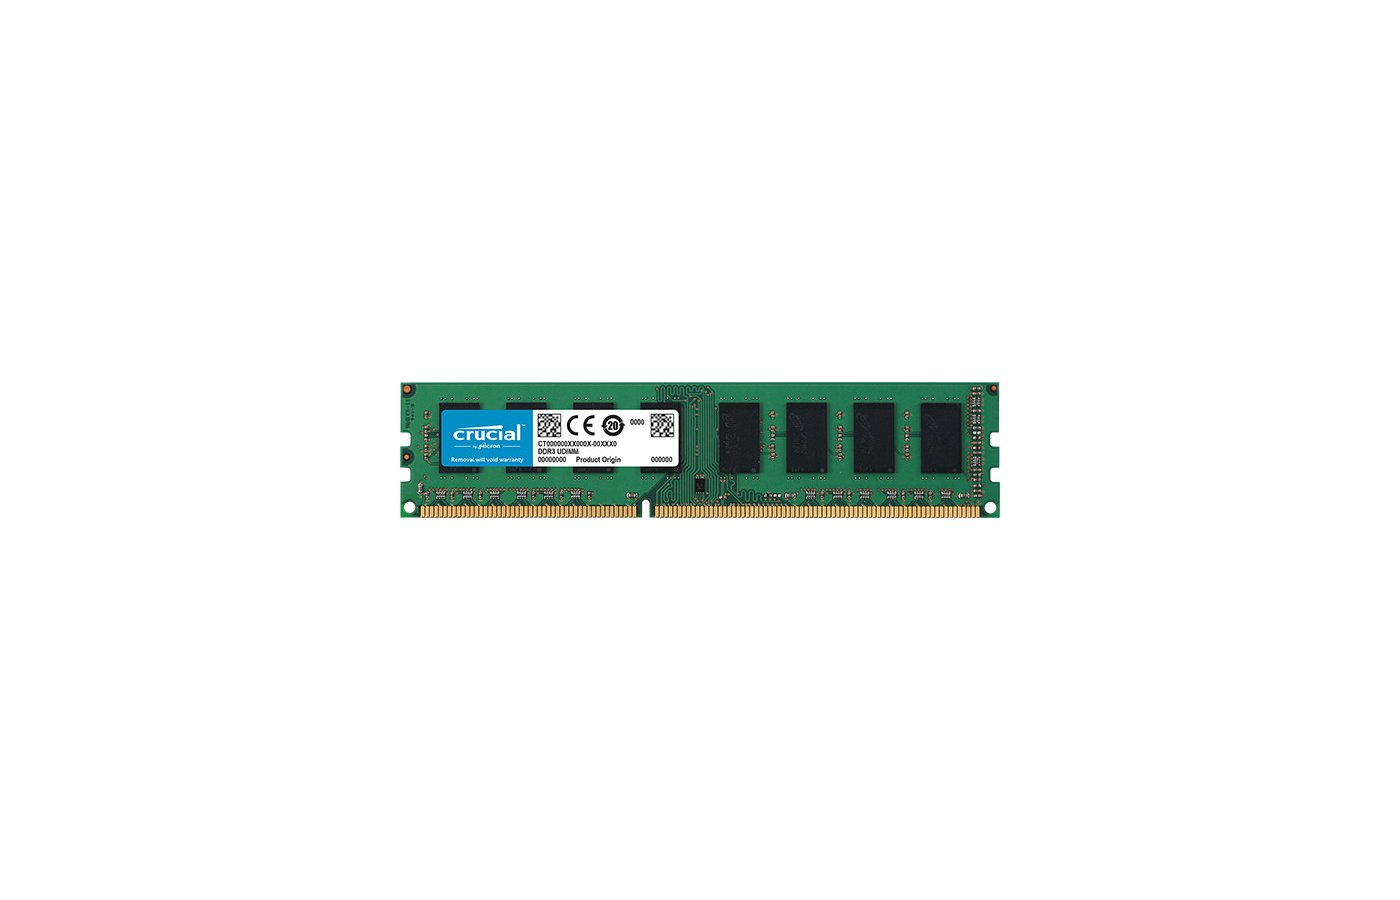 Оперативная память Crucial CT51264BD160BJ RTL PC3-12800 DDR3 4Gb 1600MHz CL11